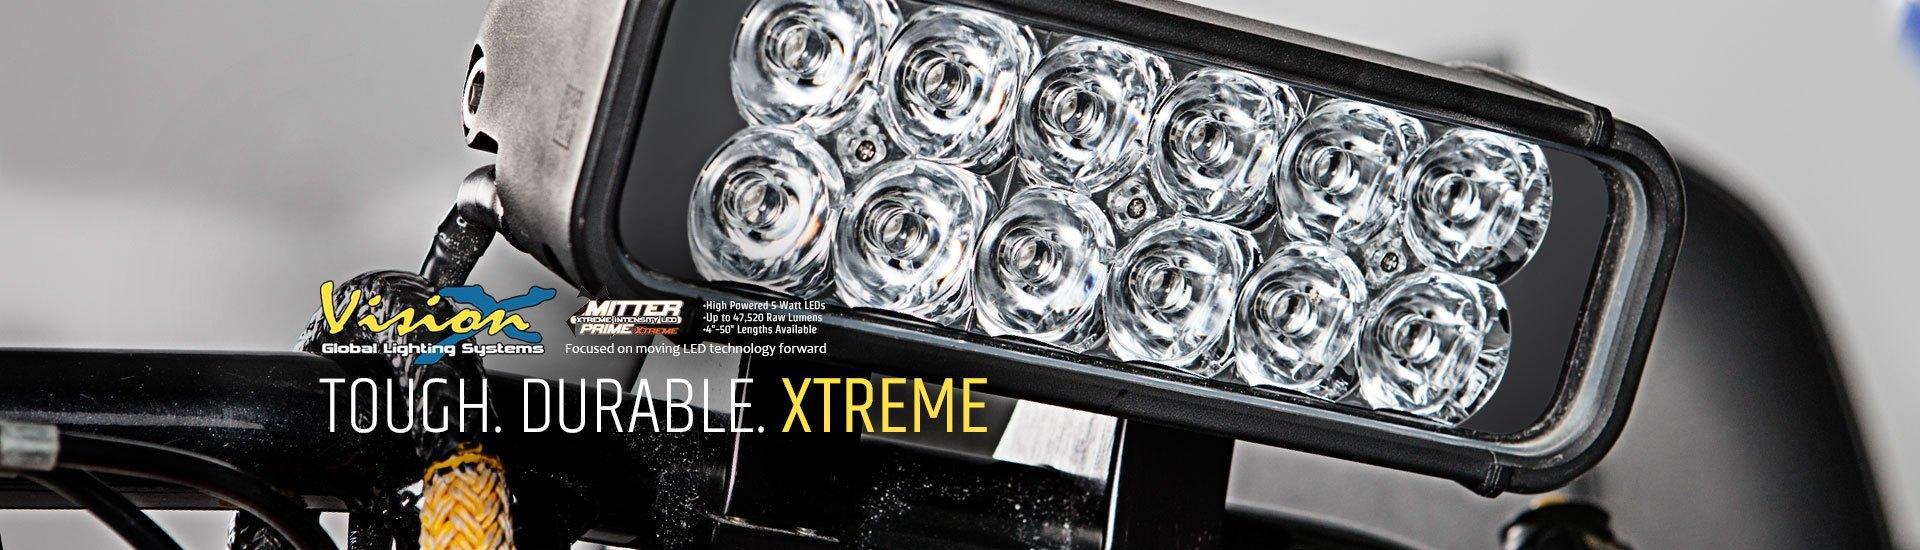 Automotive Led Lights Bars Strips Halos Bulbs Custom Light Kits Headlight Parts Best Oem On Wiring For Motorcycle